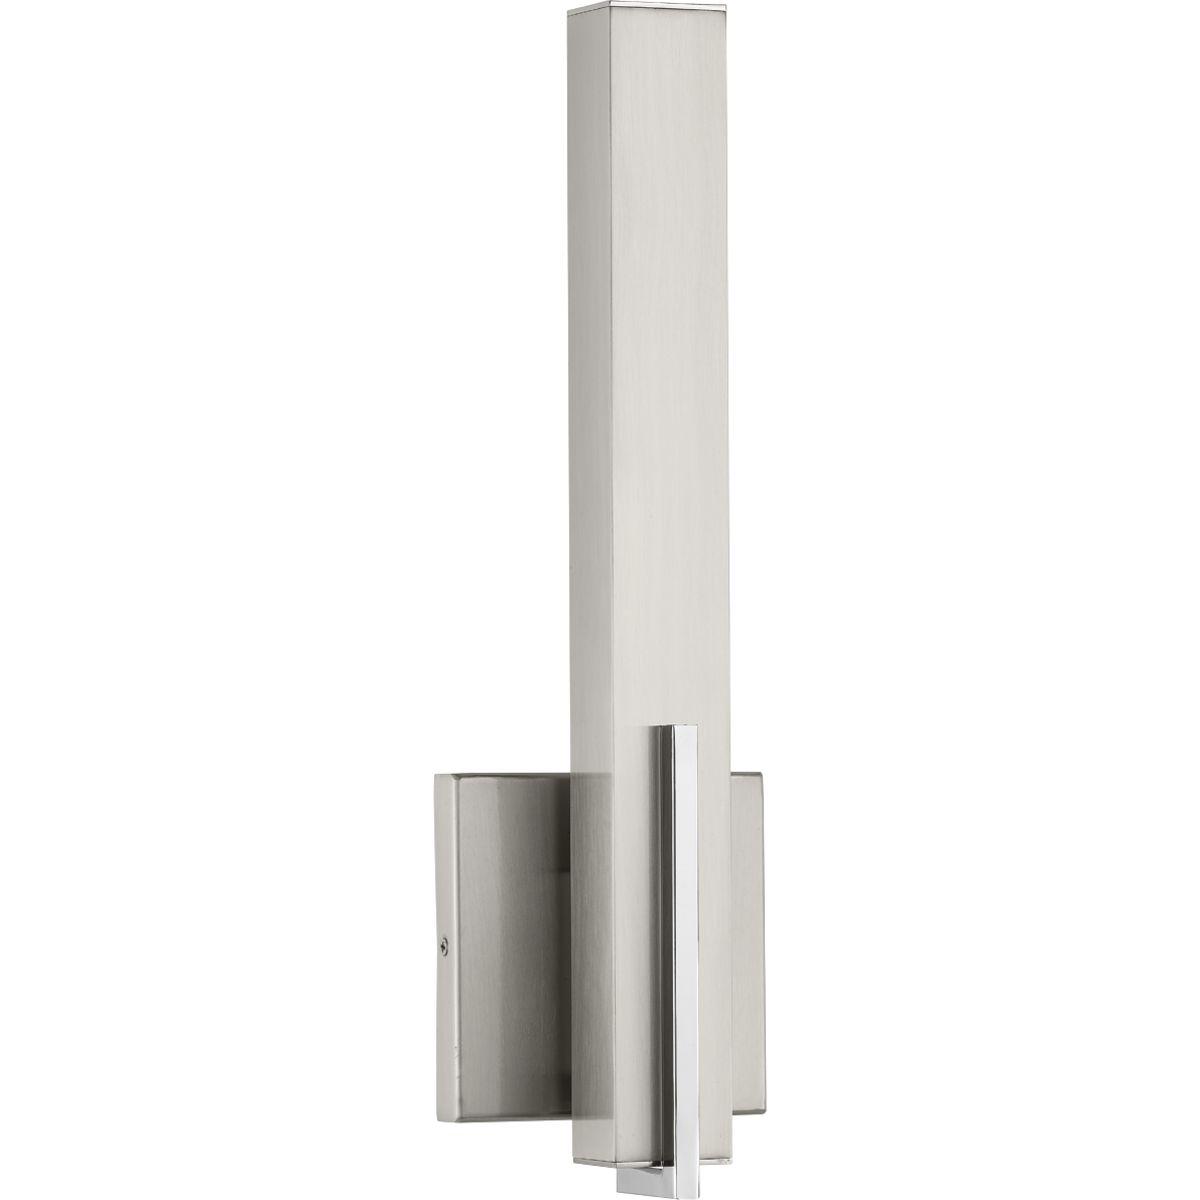 Wall Sconce Led Lighting: Planck LED Collection One-Light LED Wall Sconce, Brushed